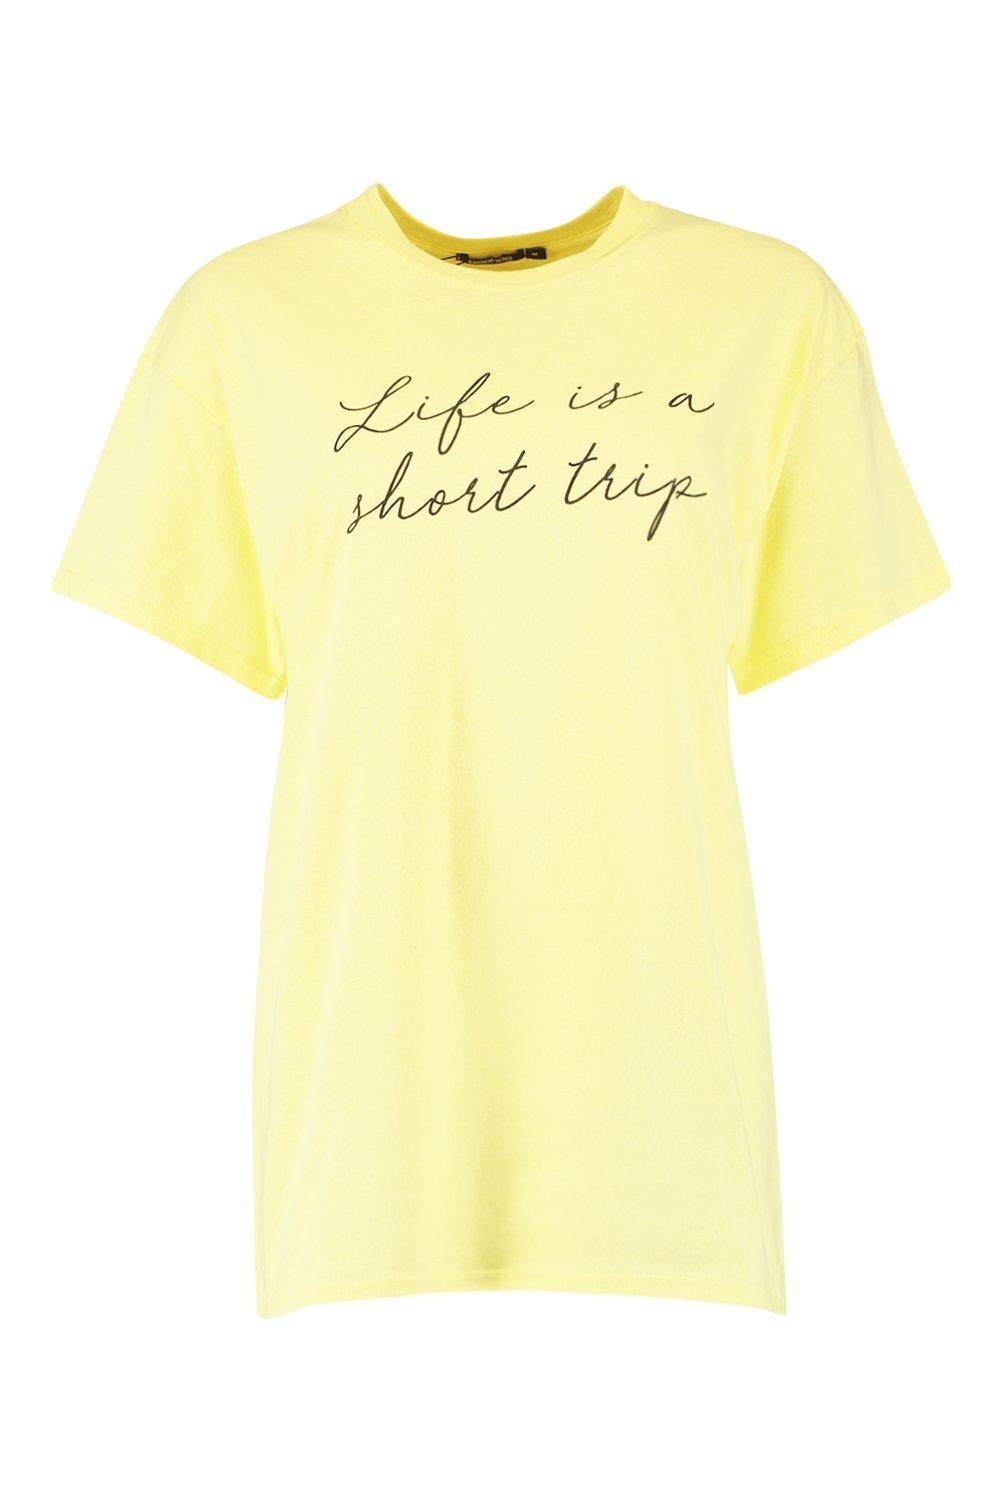 Slogan Is yellow Shirt a Short Life T Trip PqICnwd